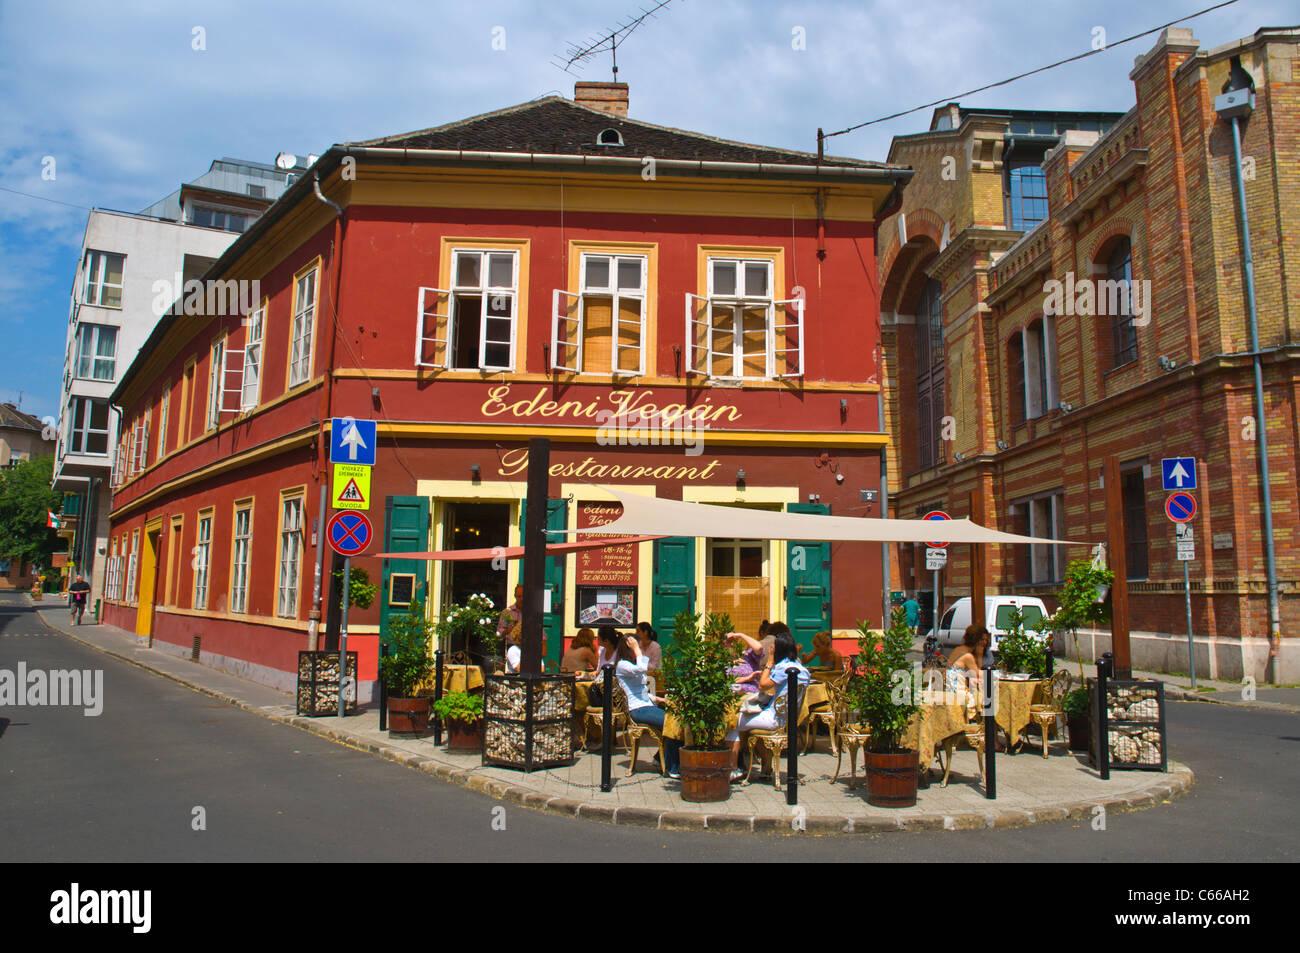 Edeni Vegan vegetarian restaurant at Batthyany ter square Buda district Budapest Hungary Europe - Stock Image